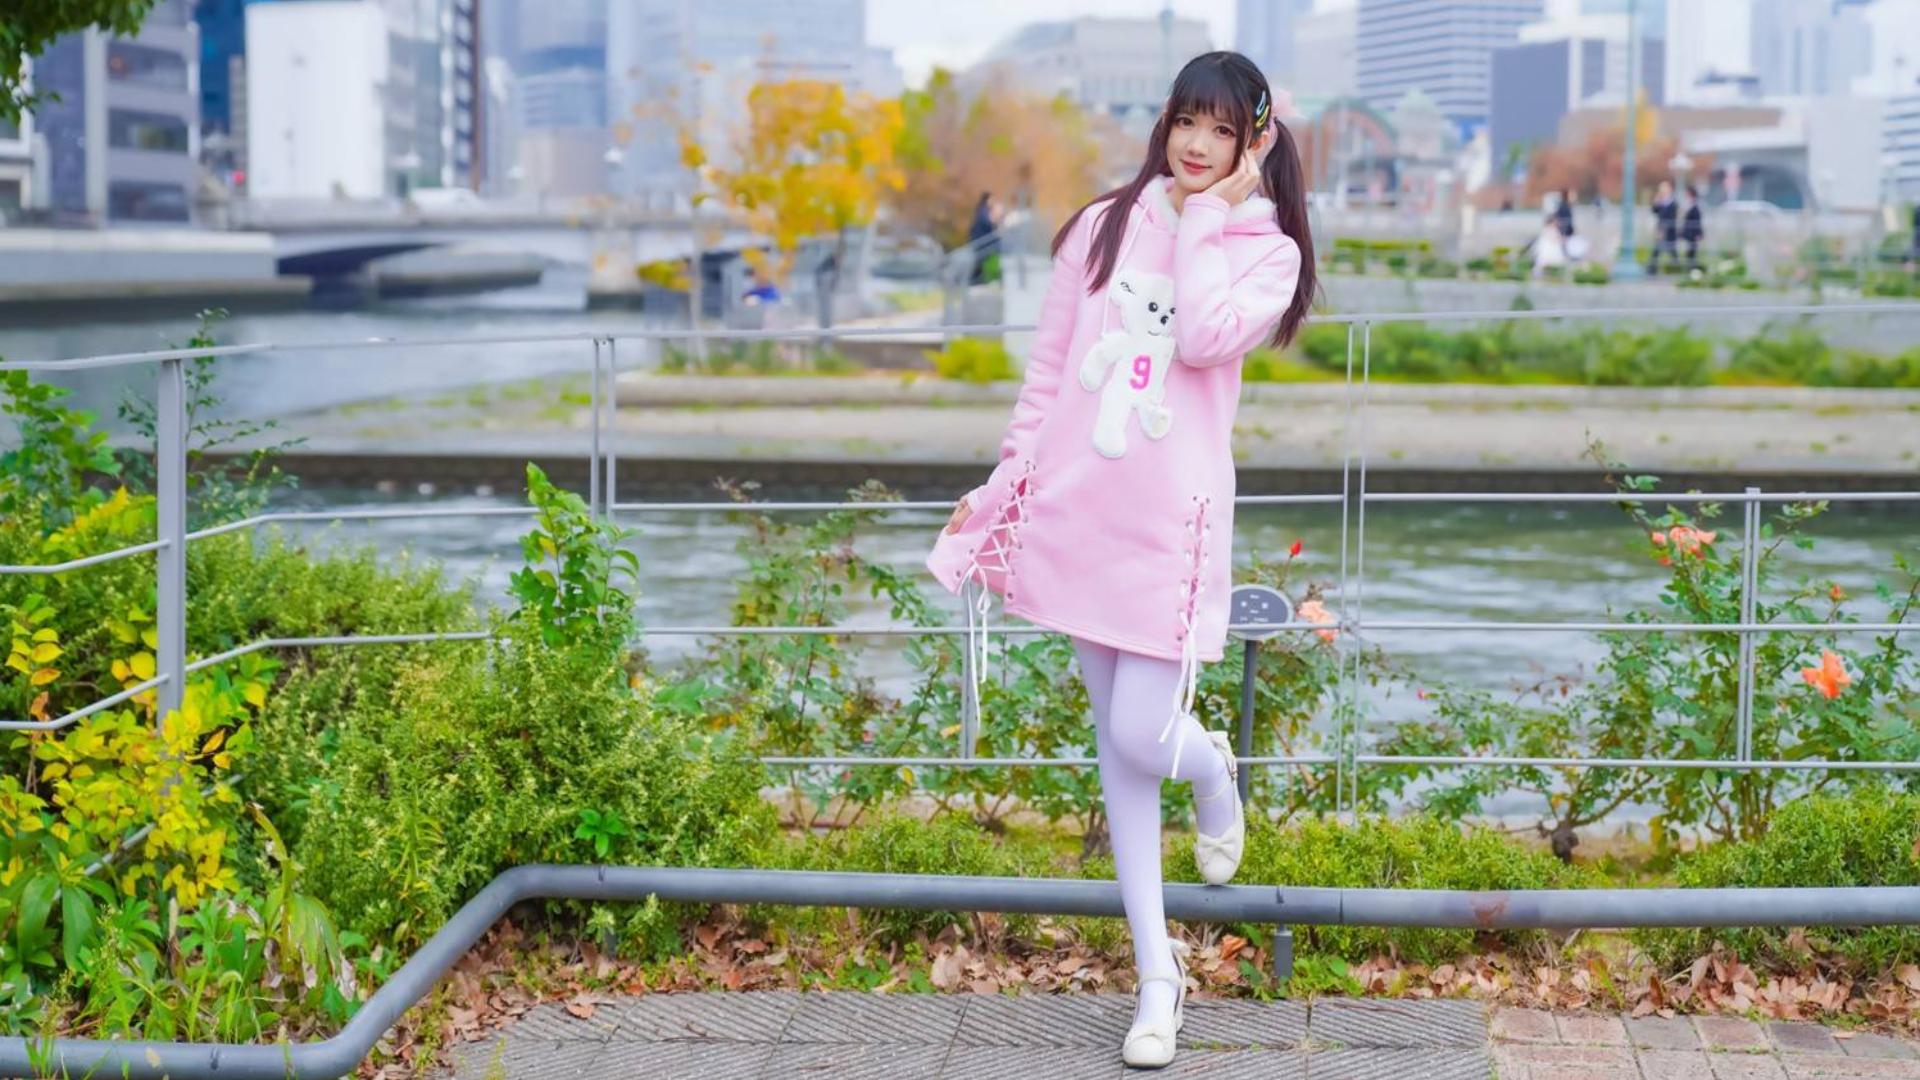 【YIYO☆】Dreaming ChuChu(圣地巡礼*中之岛)